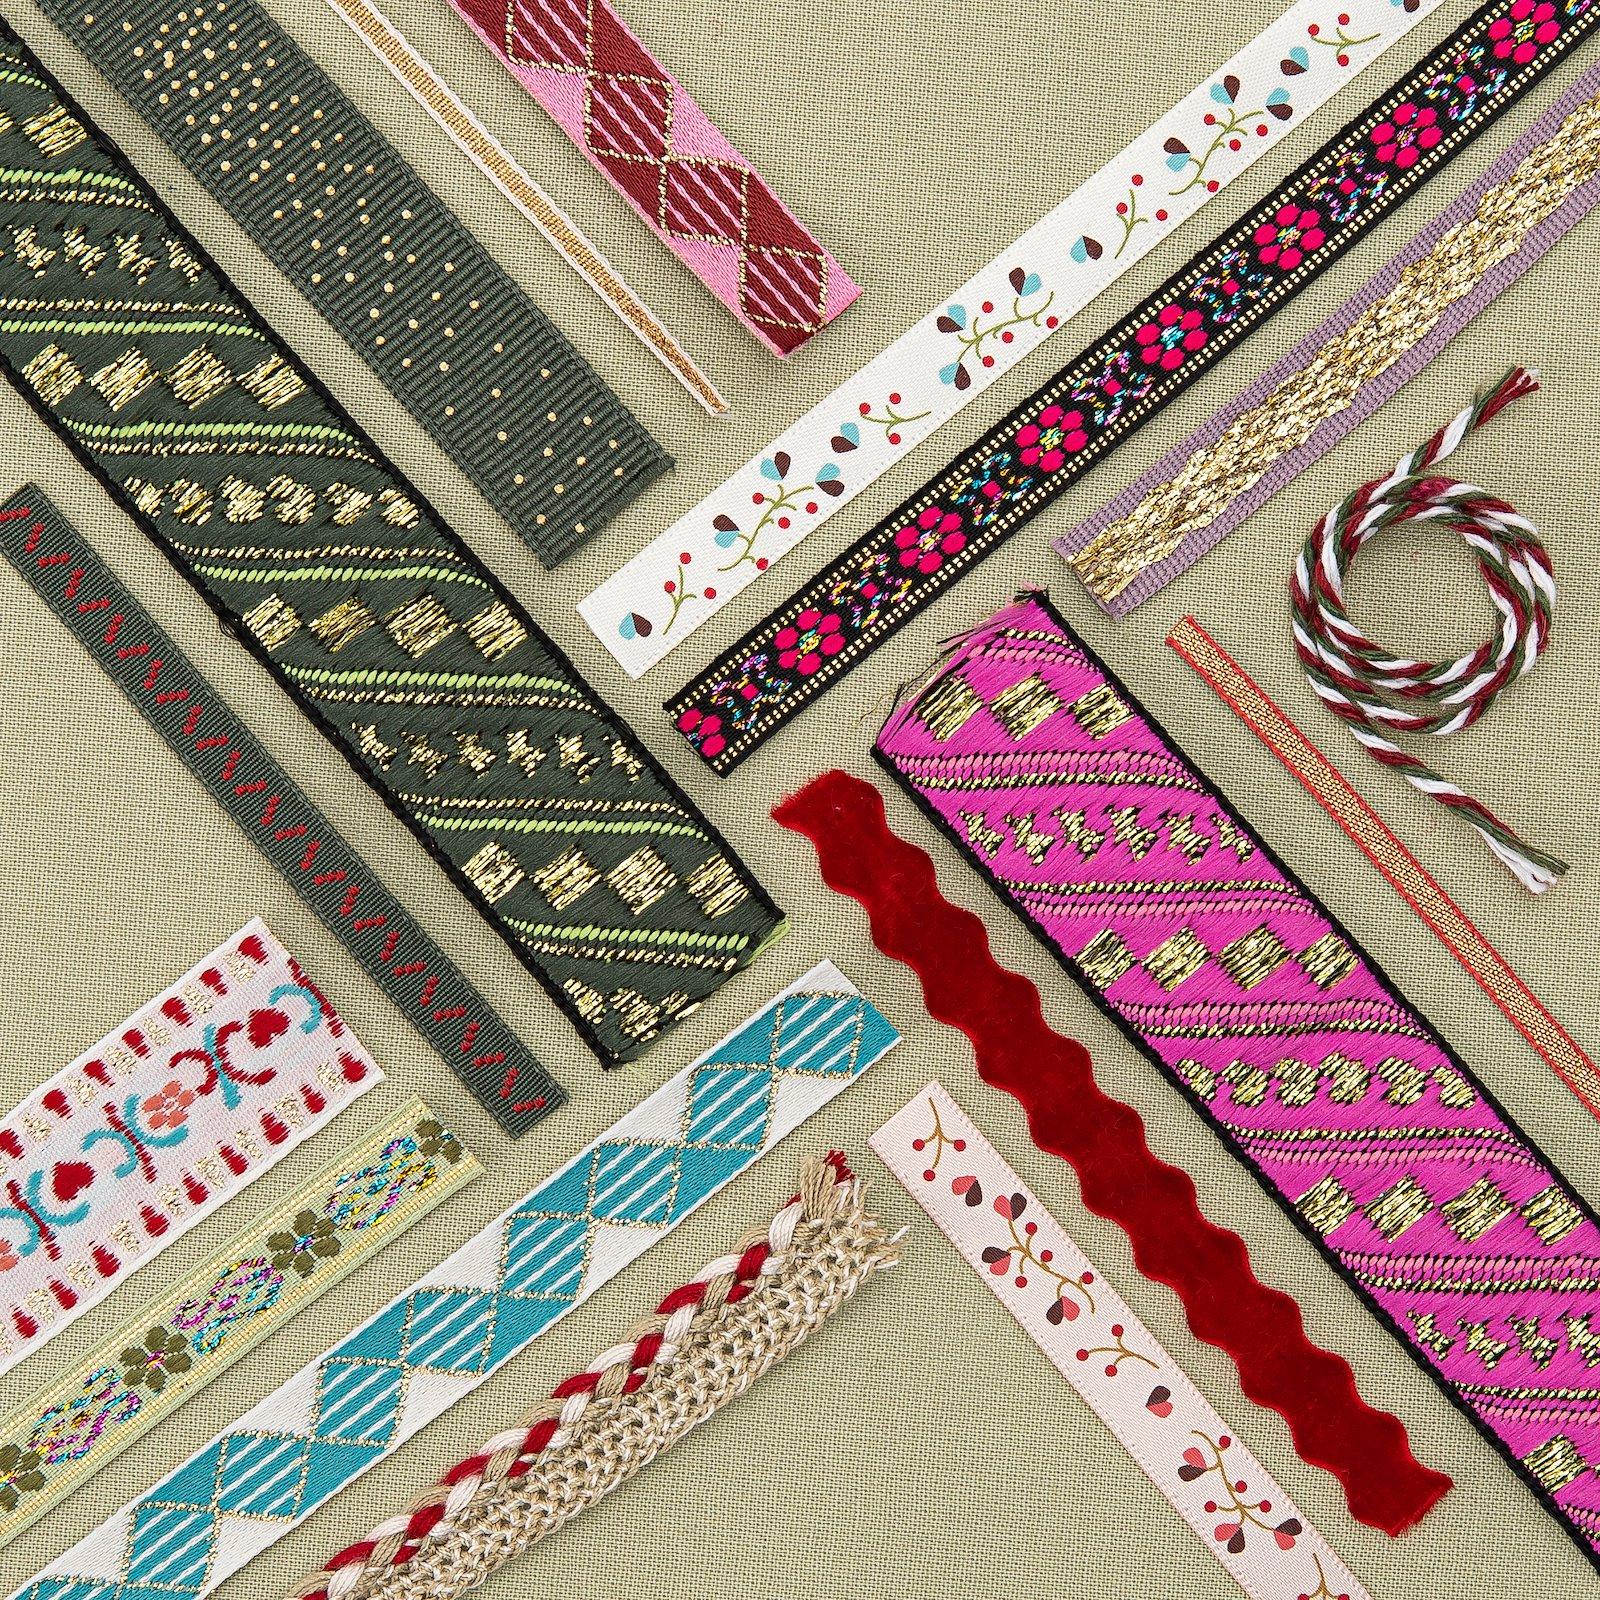 Ric rac velour ribbon 10mm red 2m 22360_22268_22365_22287_22368_21437_22334_22234_22335_22213_22267_22255_22362_22367_22358_bundle